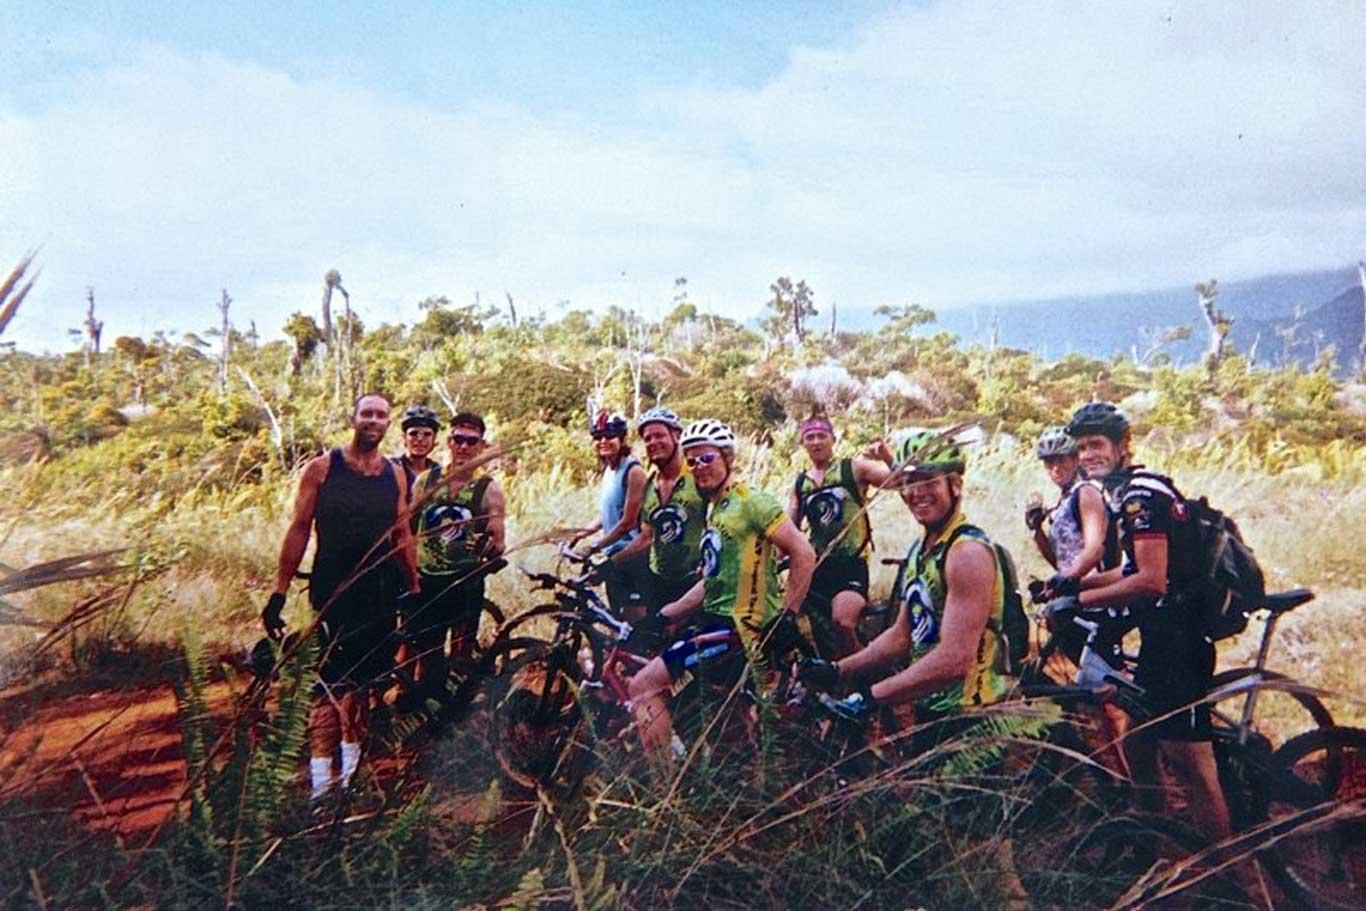 group-ride.jpg